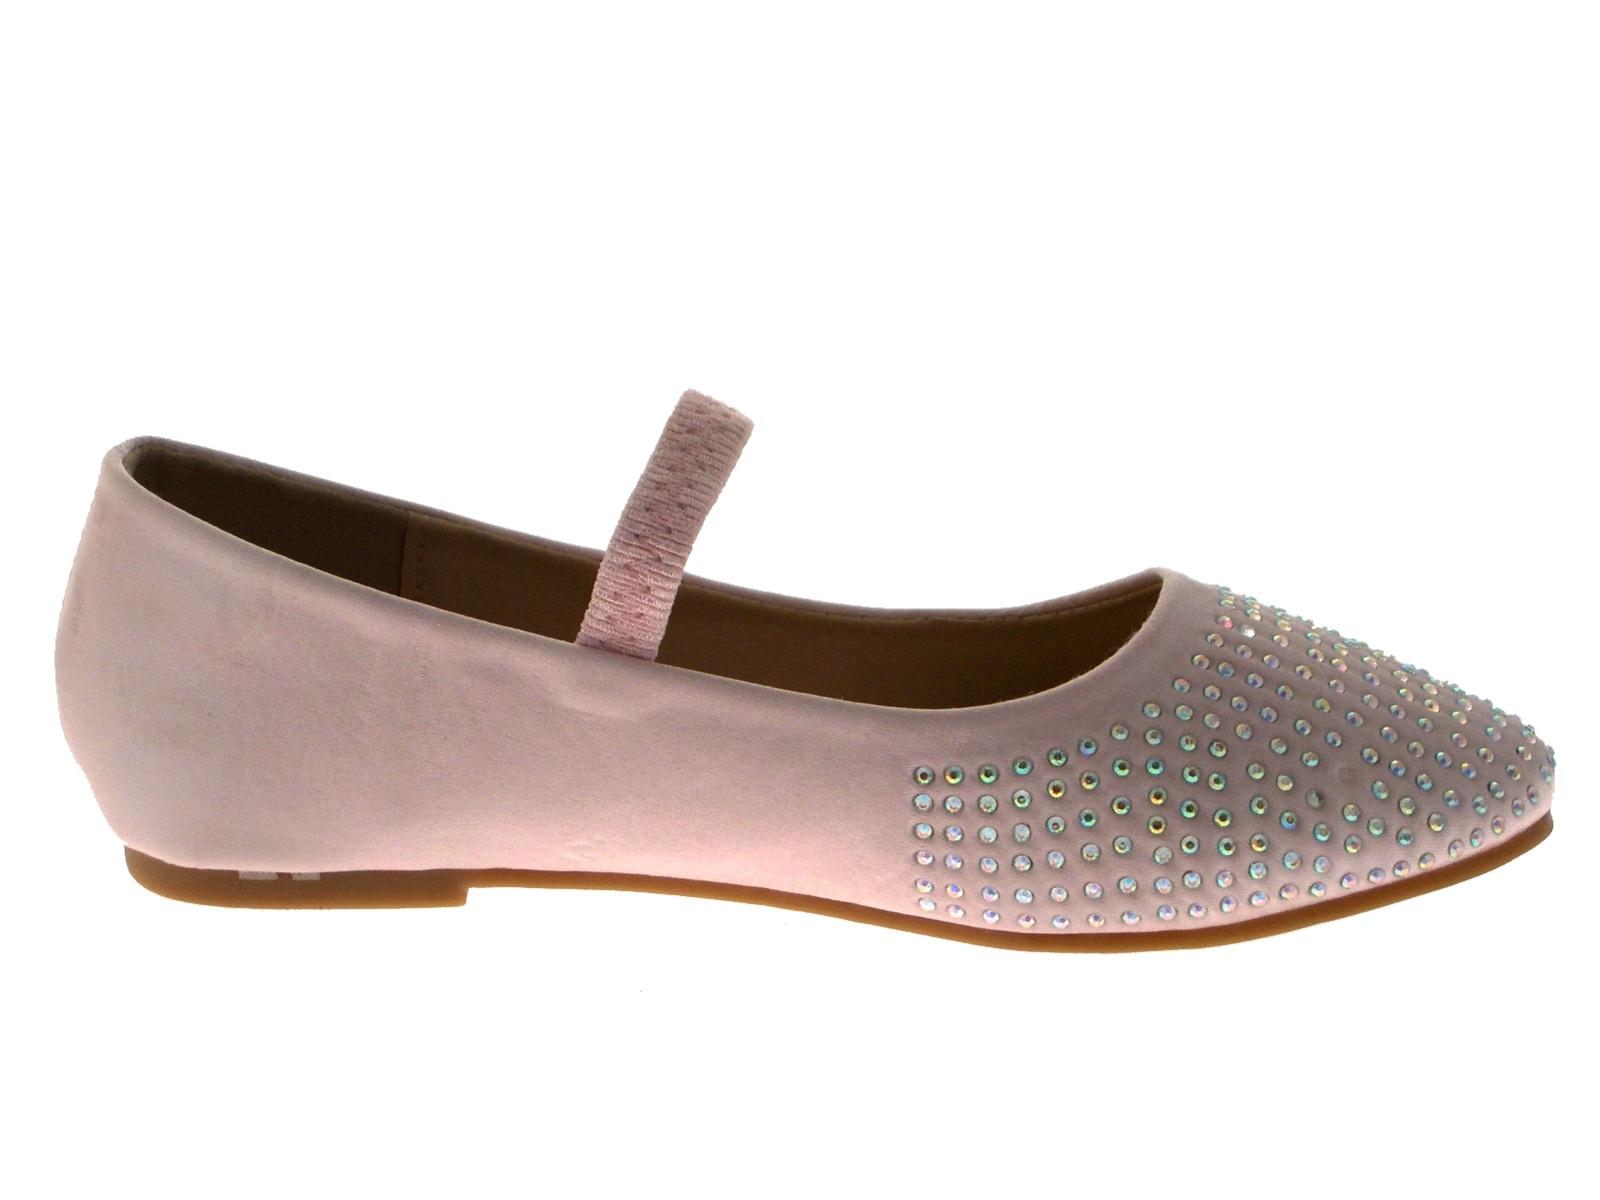 Girls Kids Satin Diamante Ballet Pumps Childrens Flat Party Shoes Size UK 12-2.5 | EBay